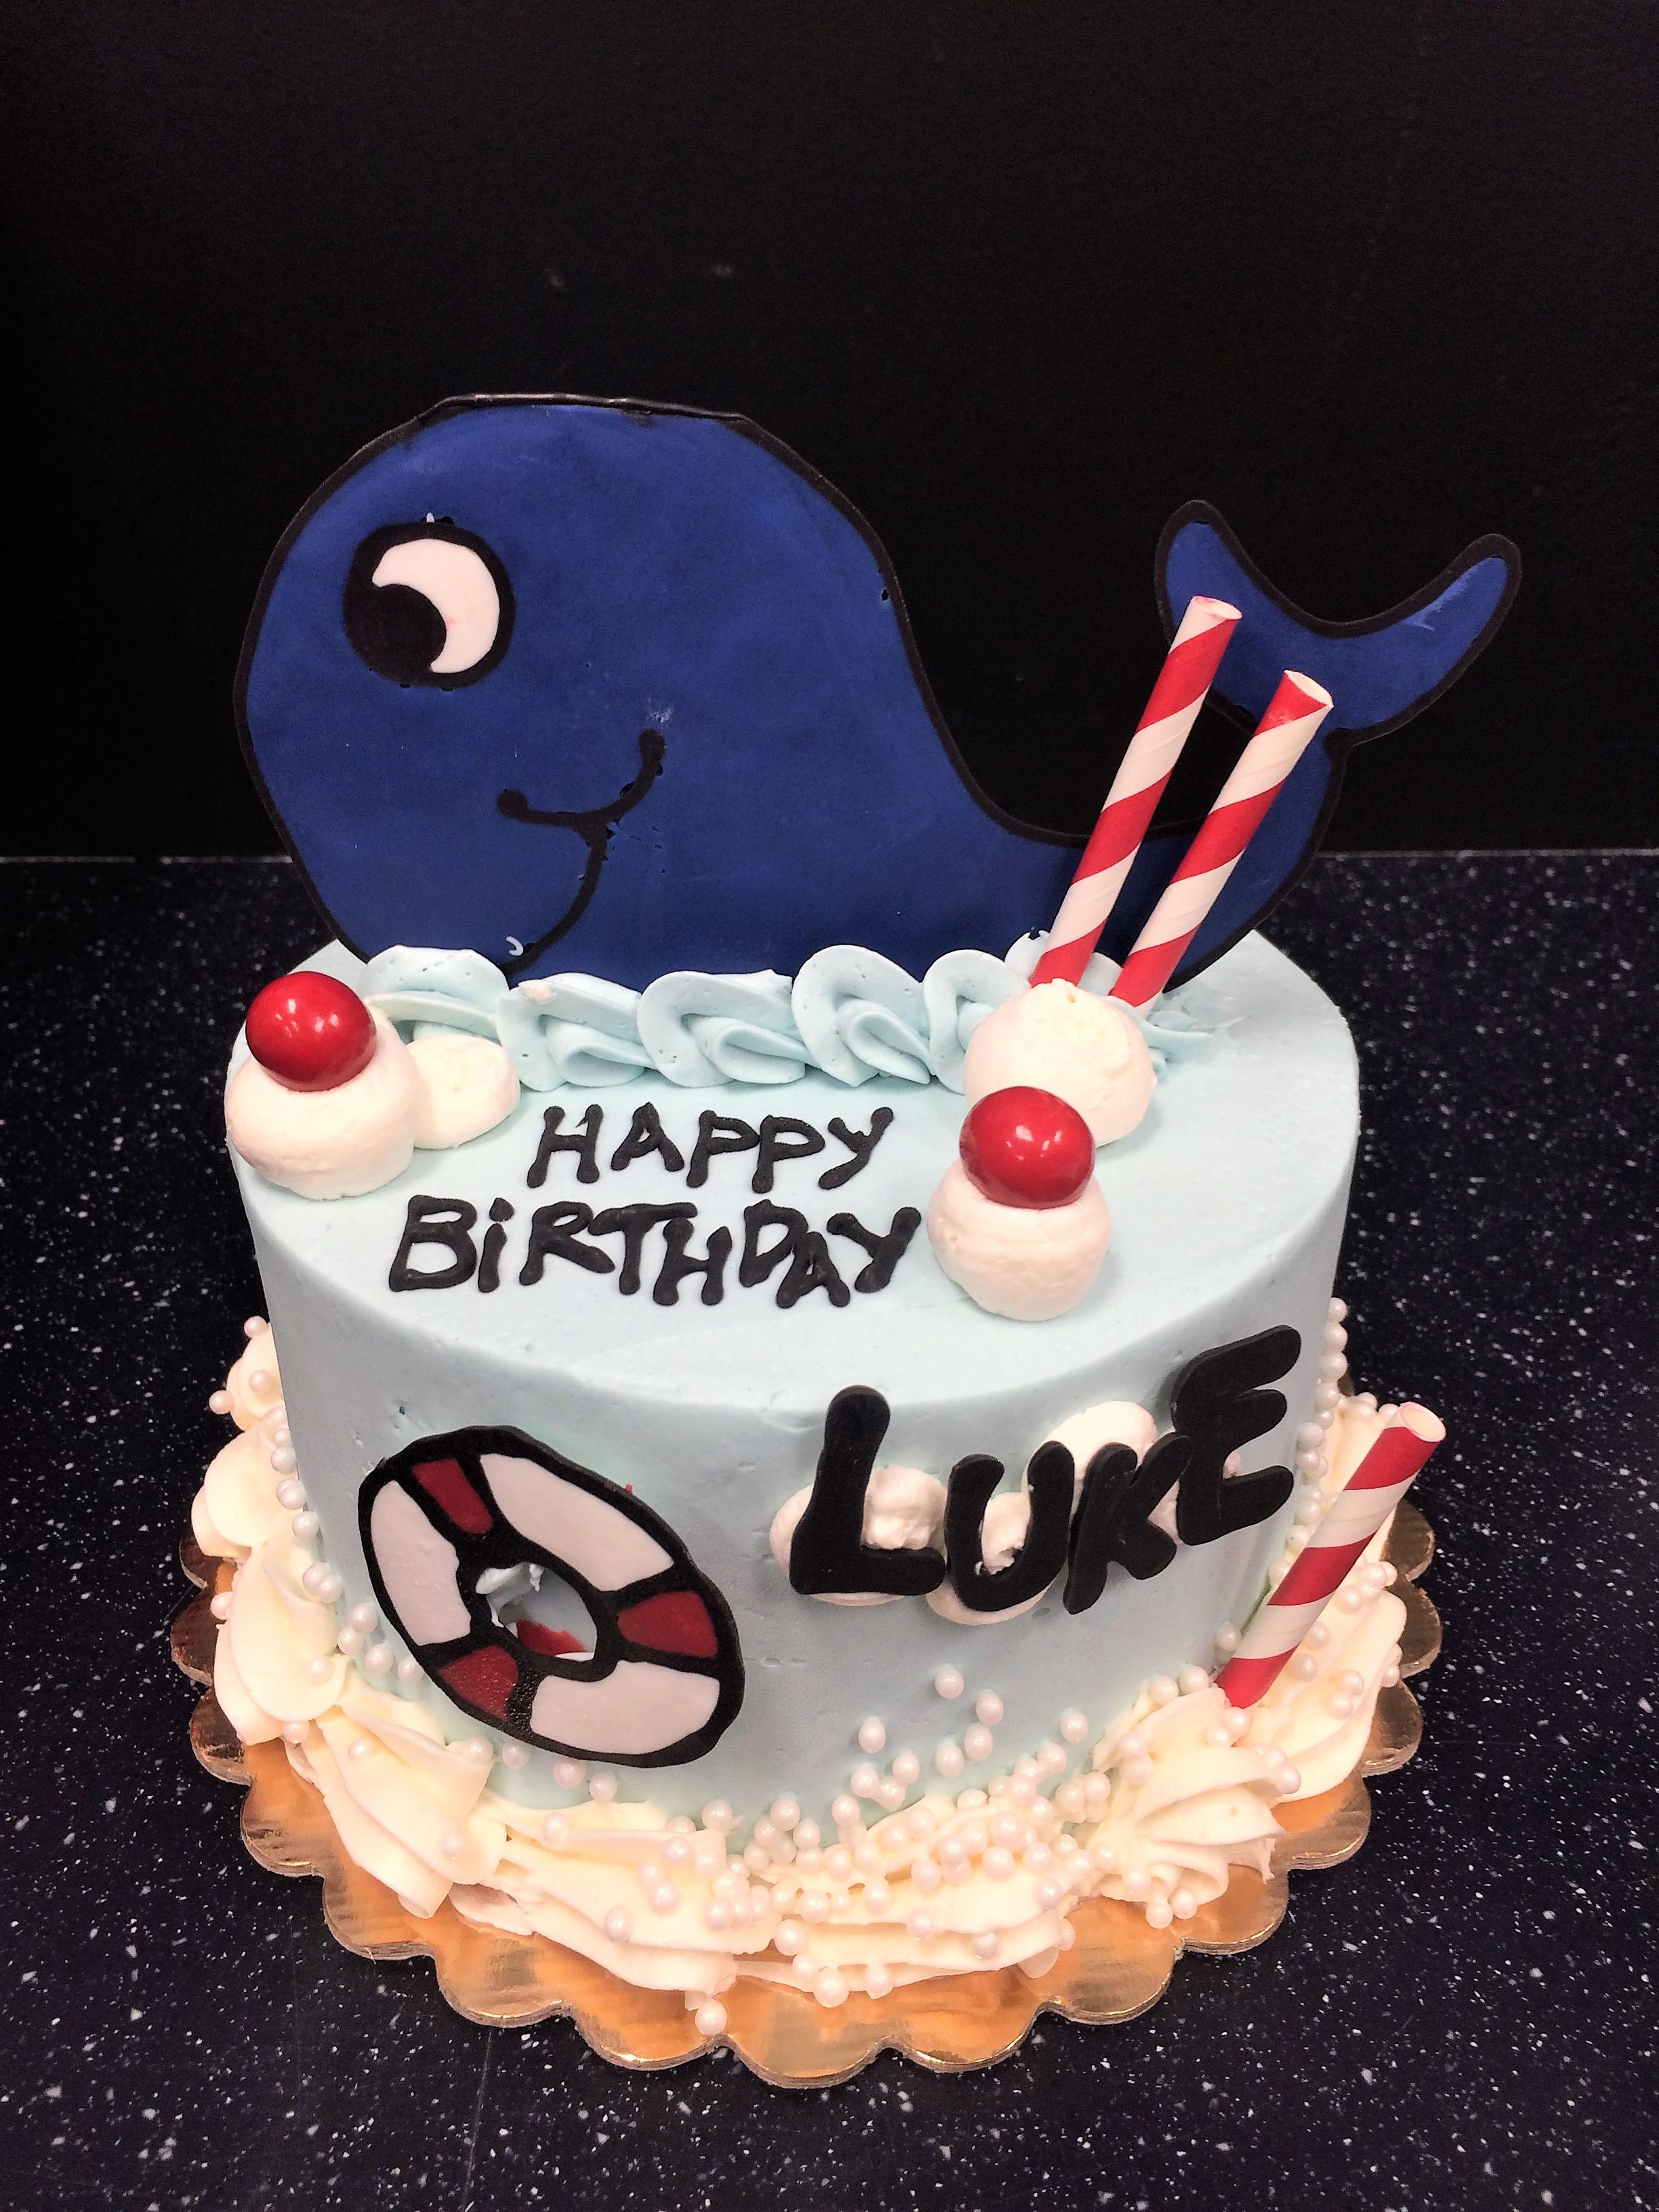 6'' cake